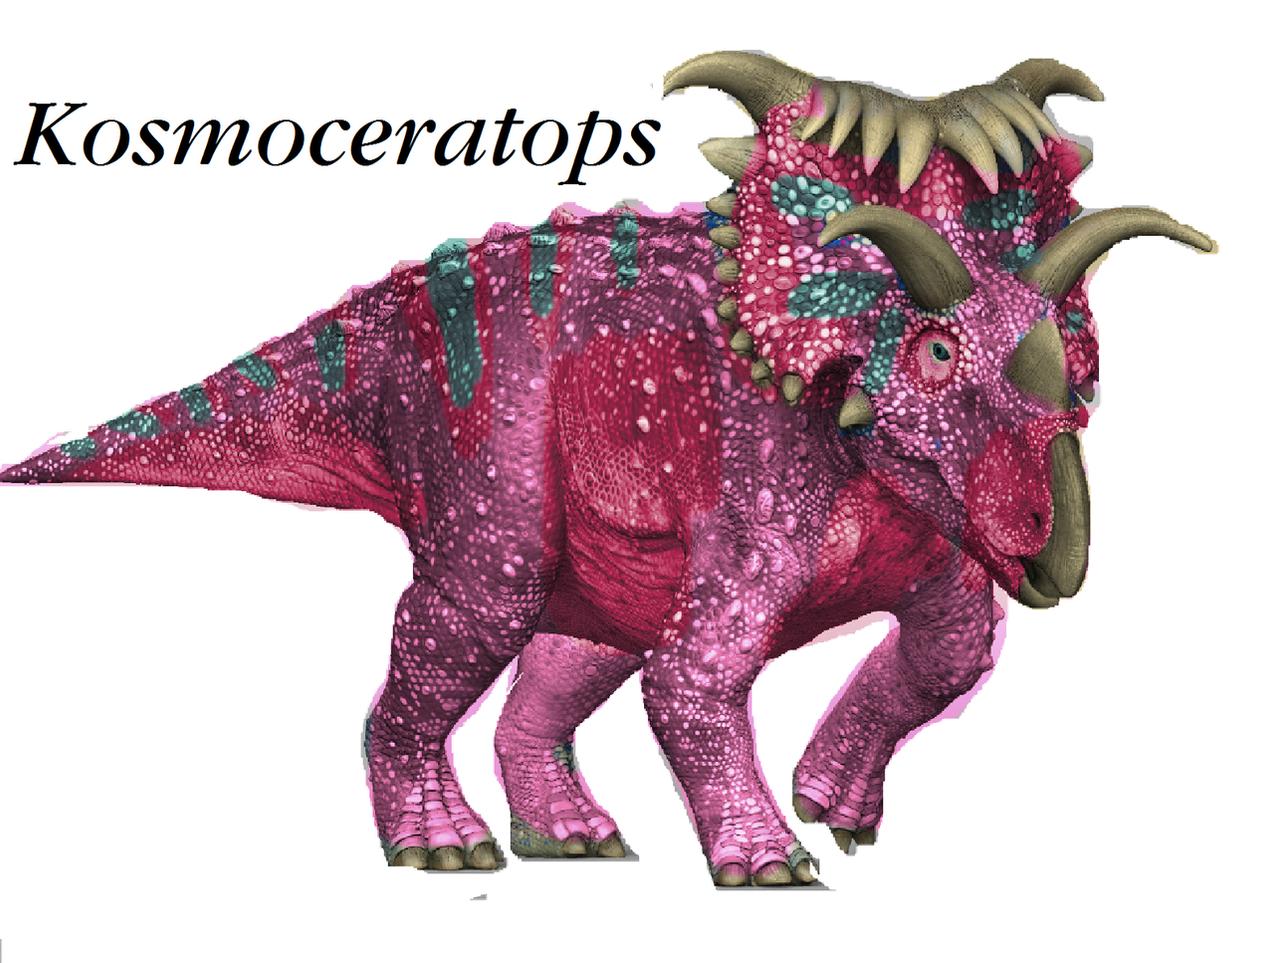 dino dan parasaurolophus - photo #8